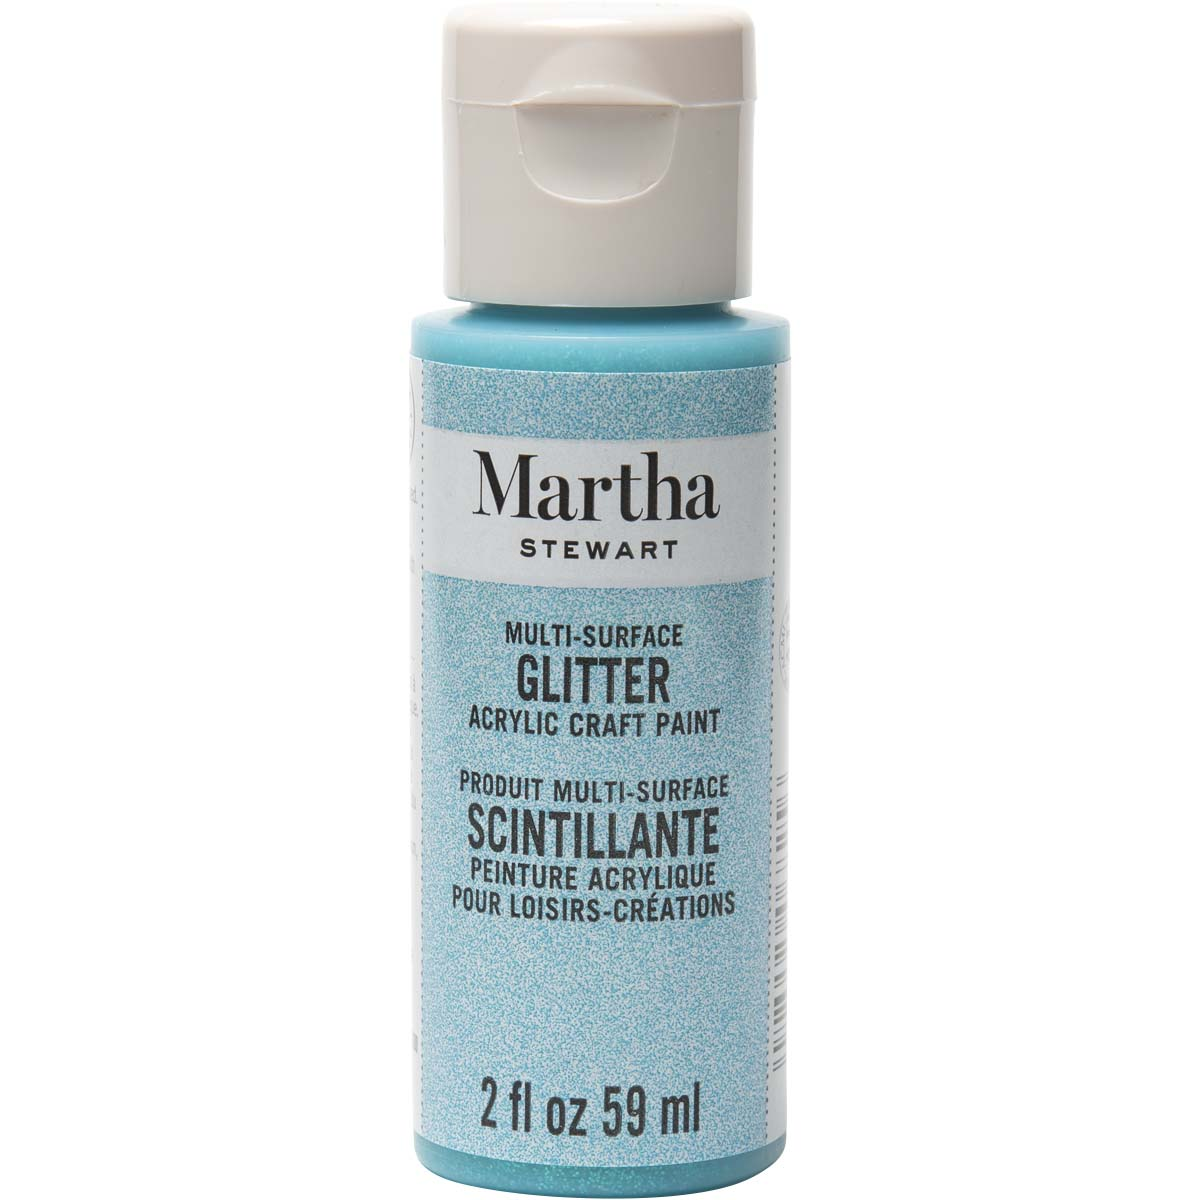 Martha Stewart ® Multi-Surface Glitter Acrylic Craft Paint - Blueberry Slush, 2 oz. - 32146CA